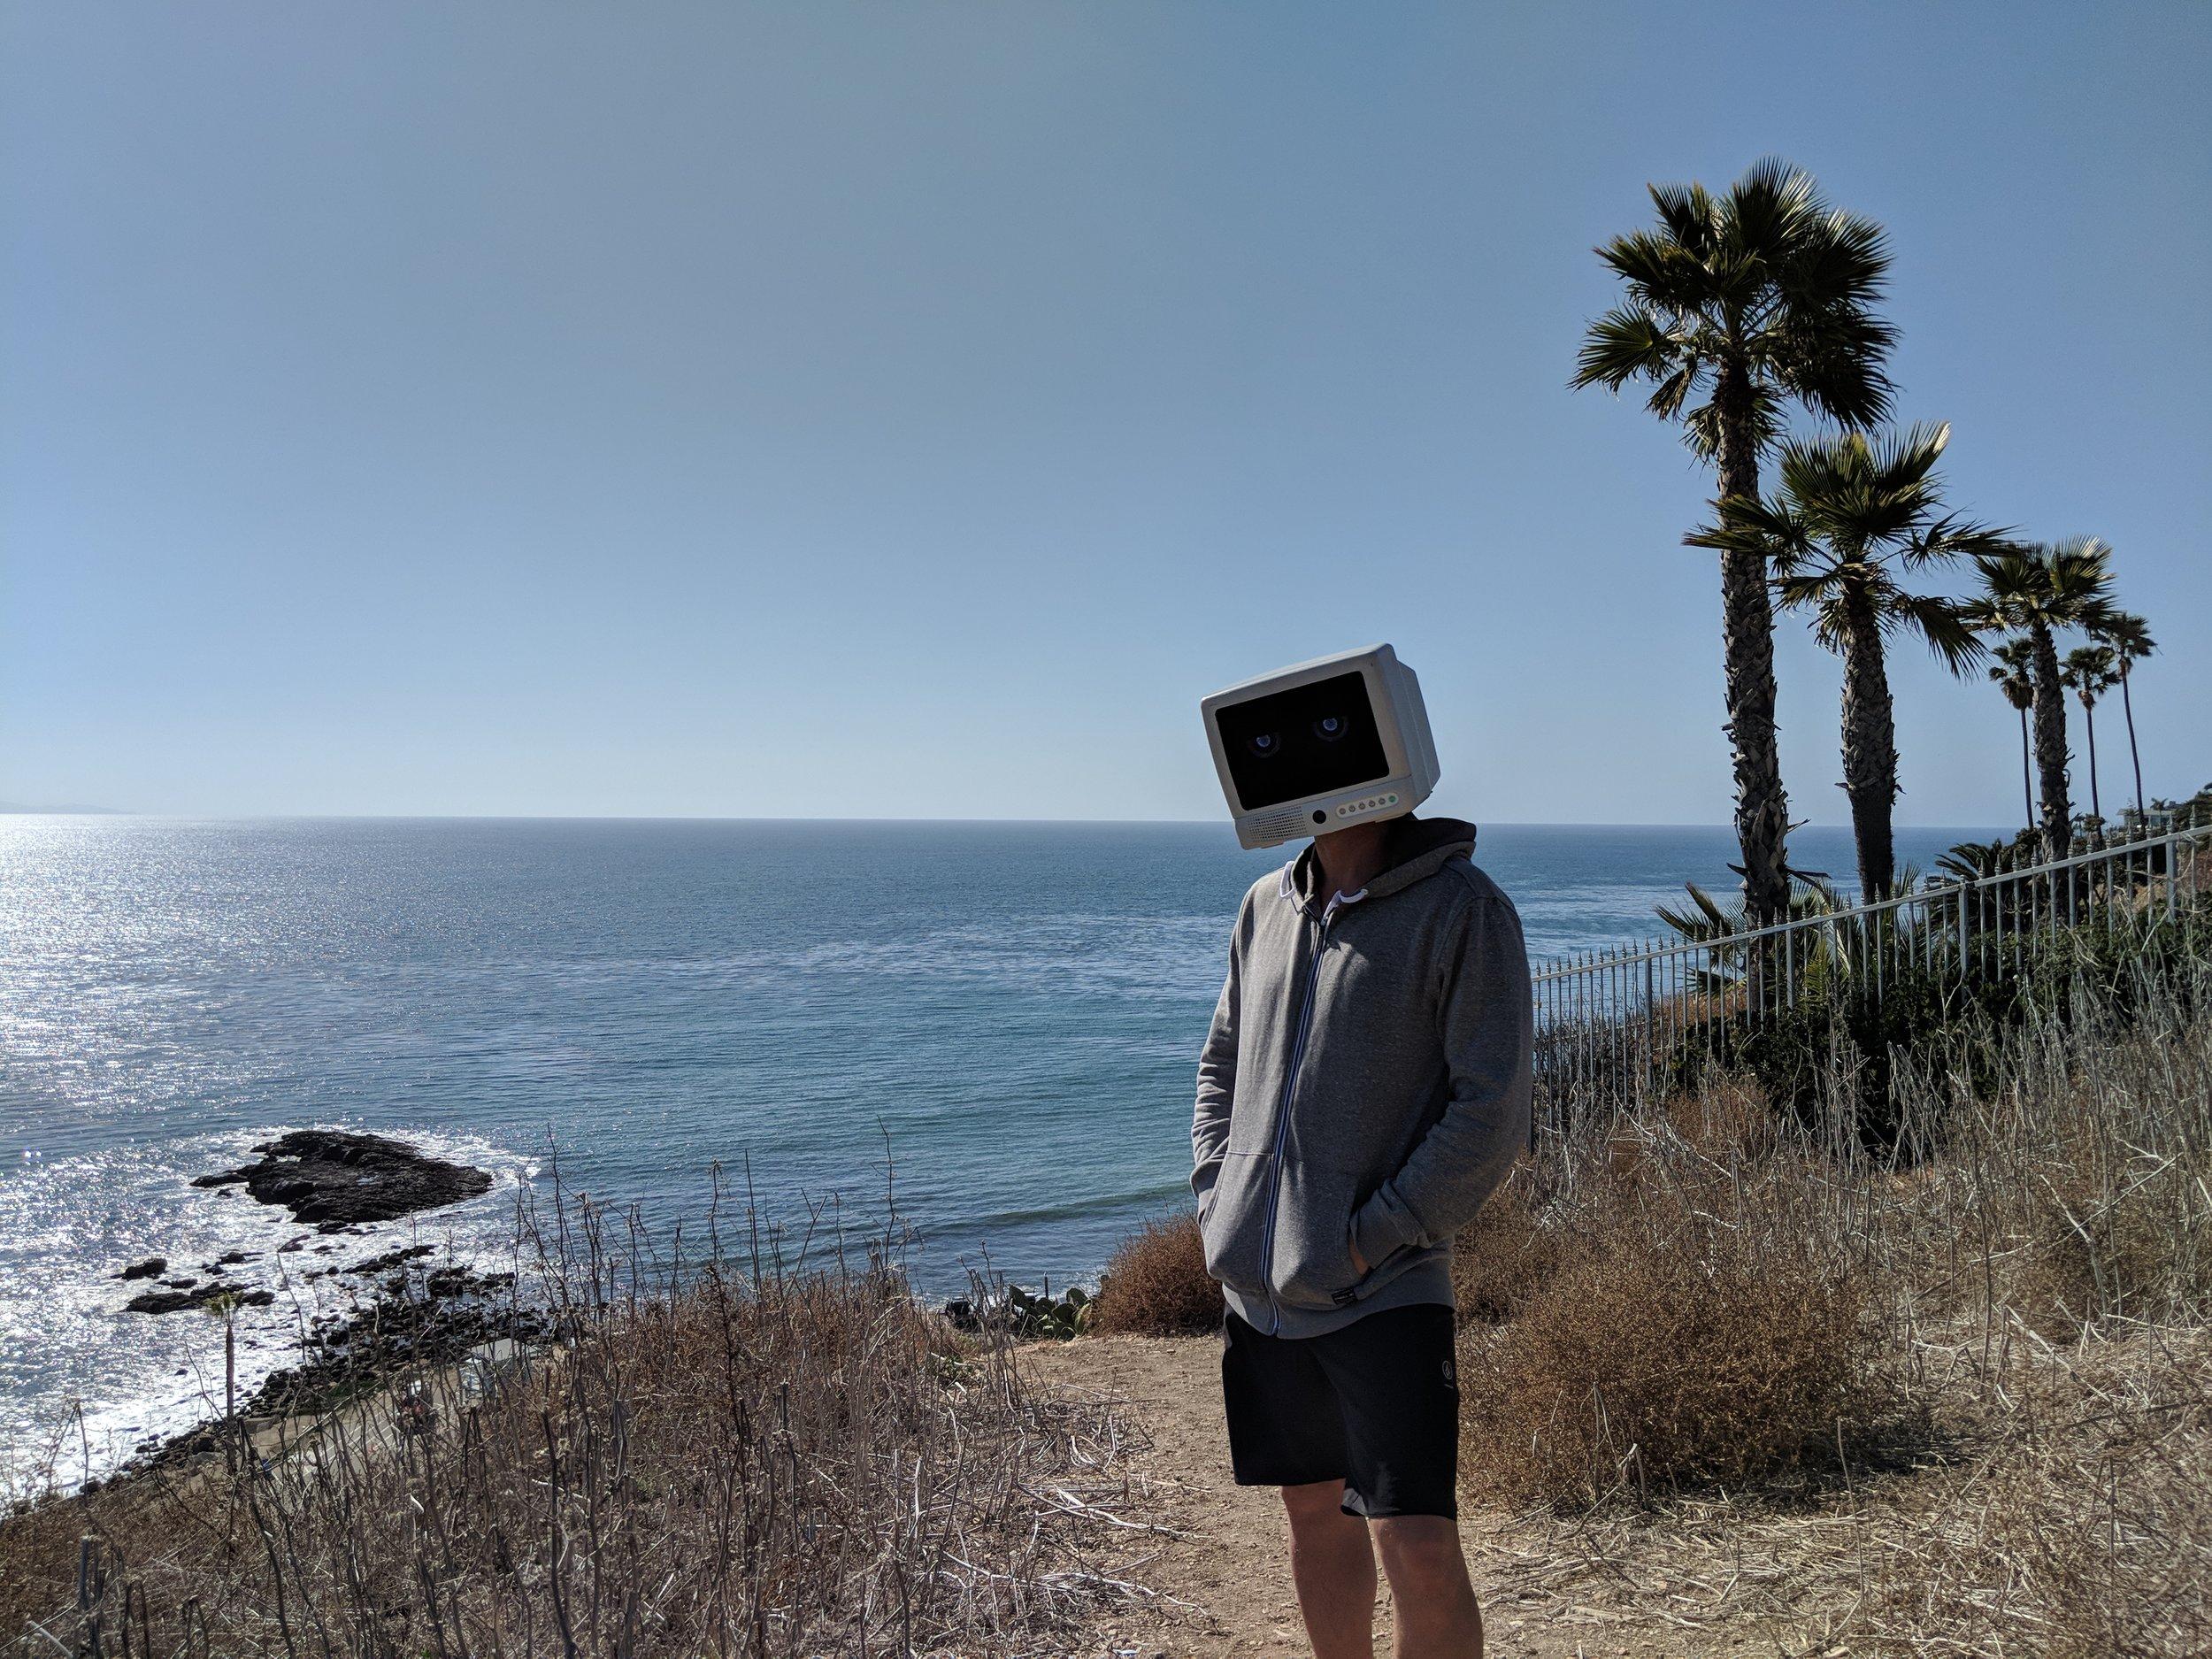 robot by the ocean.jpg